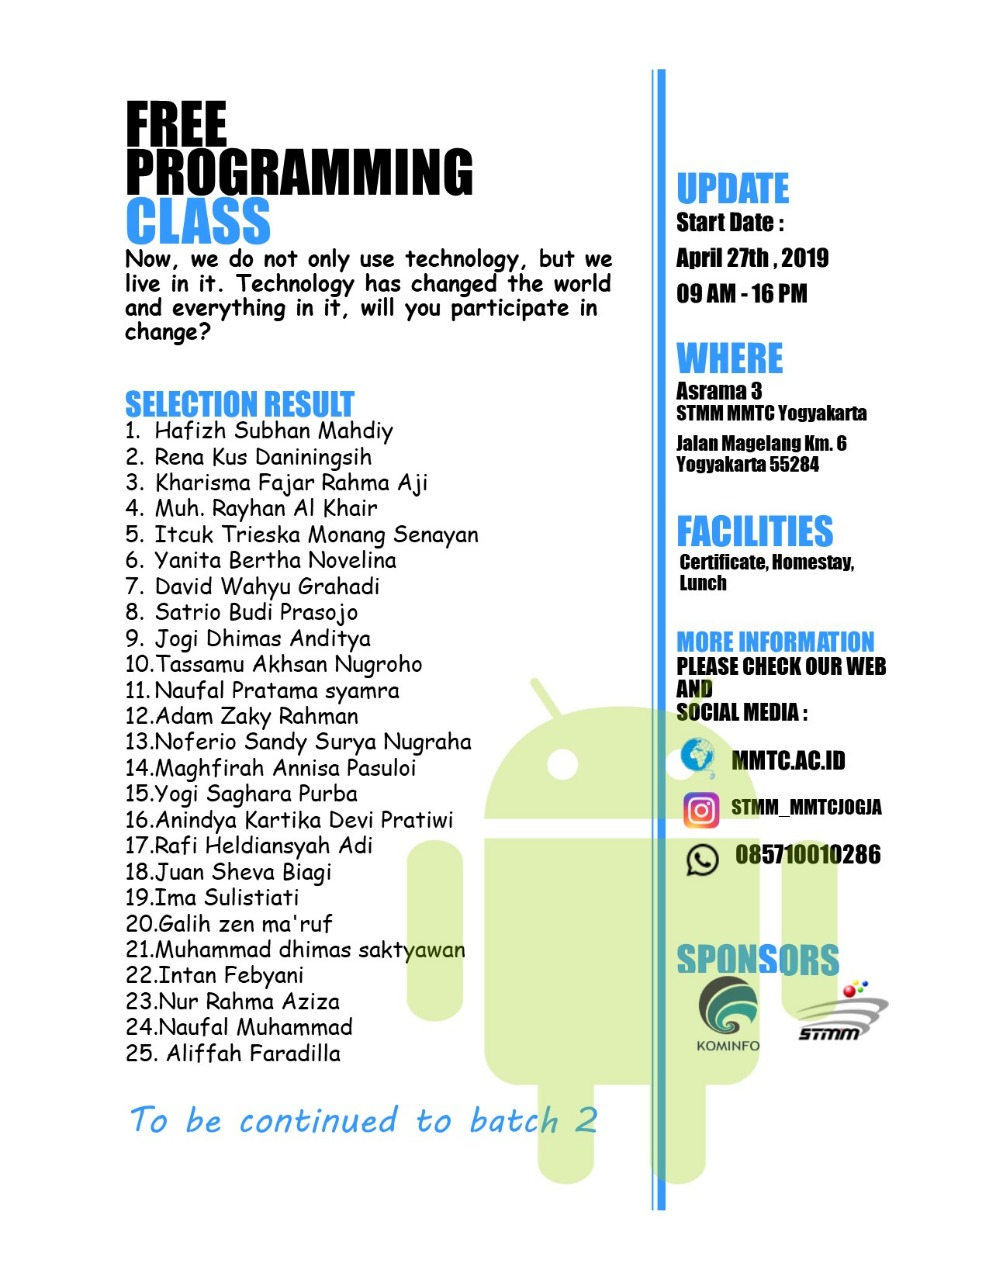 Pengumuman Hasil Seleksi Free Programming Class